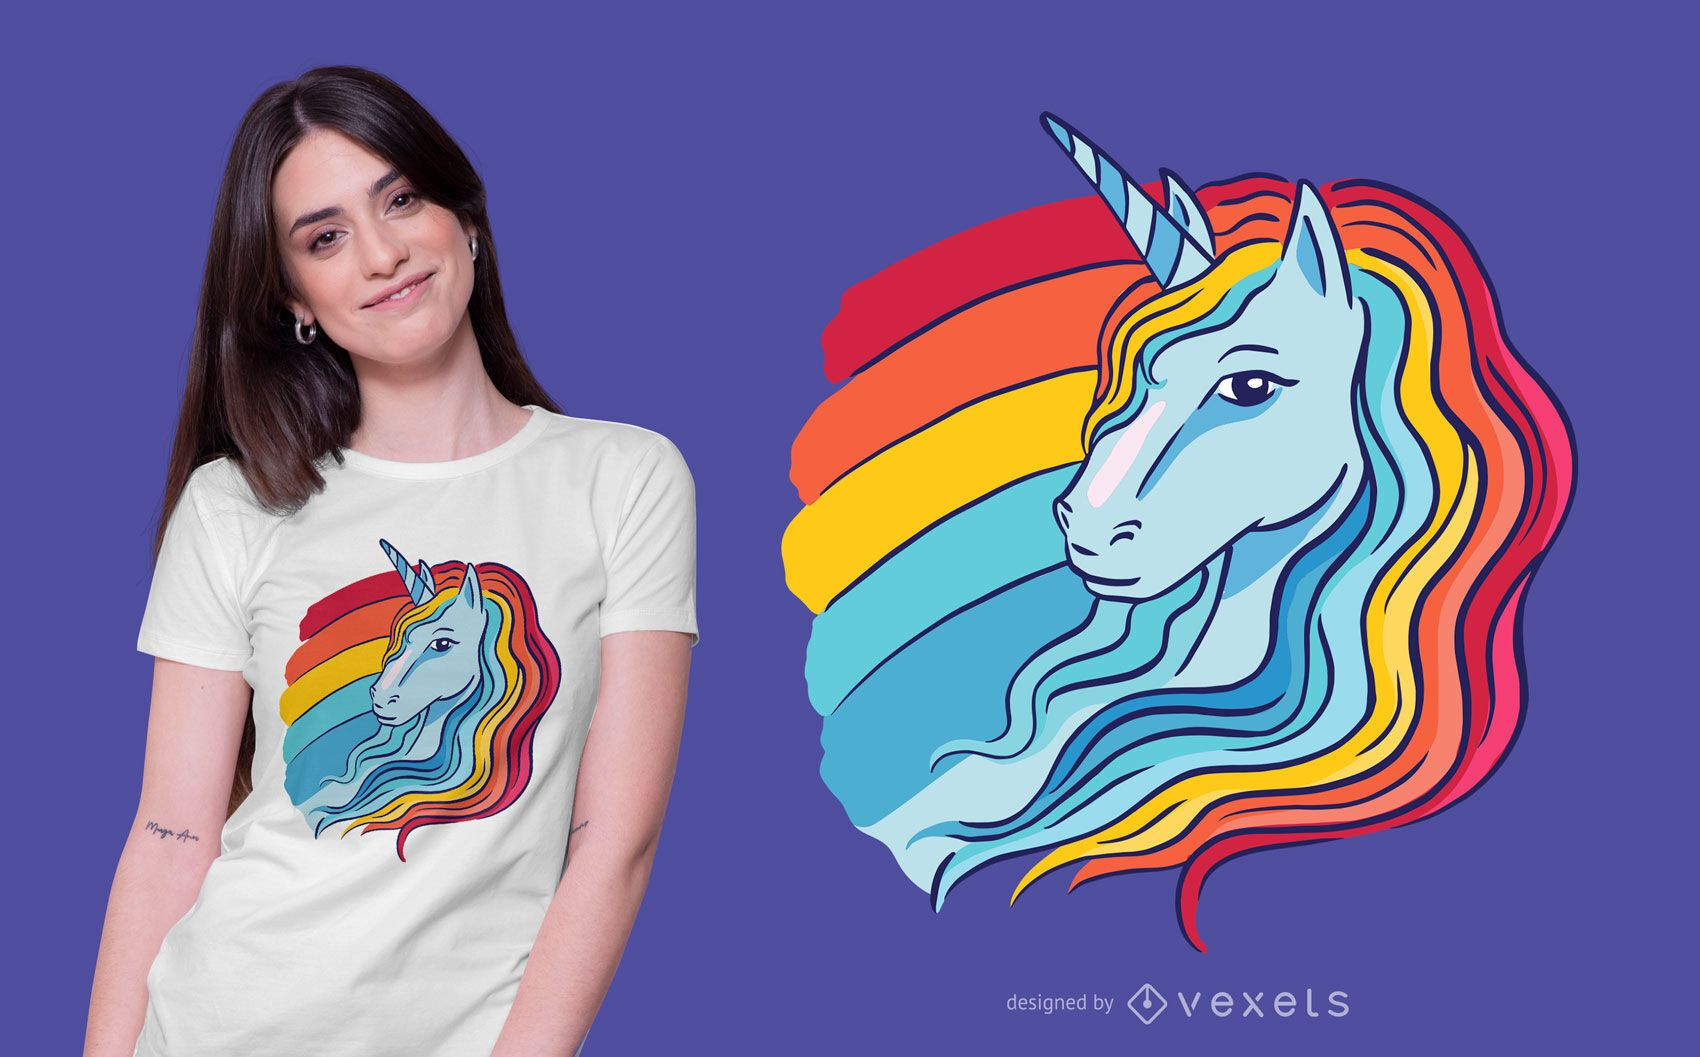 Dise?o de camiseta Rainbow Unicorn Illustration